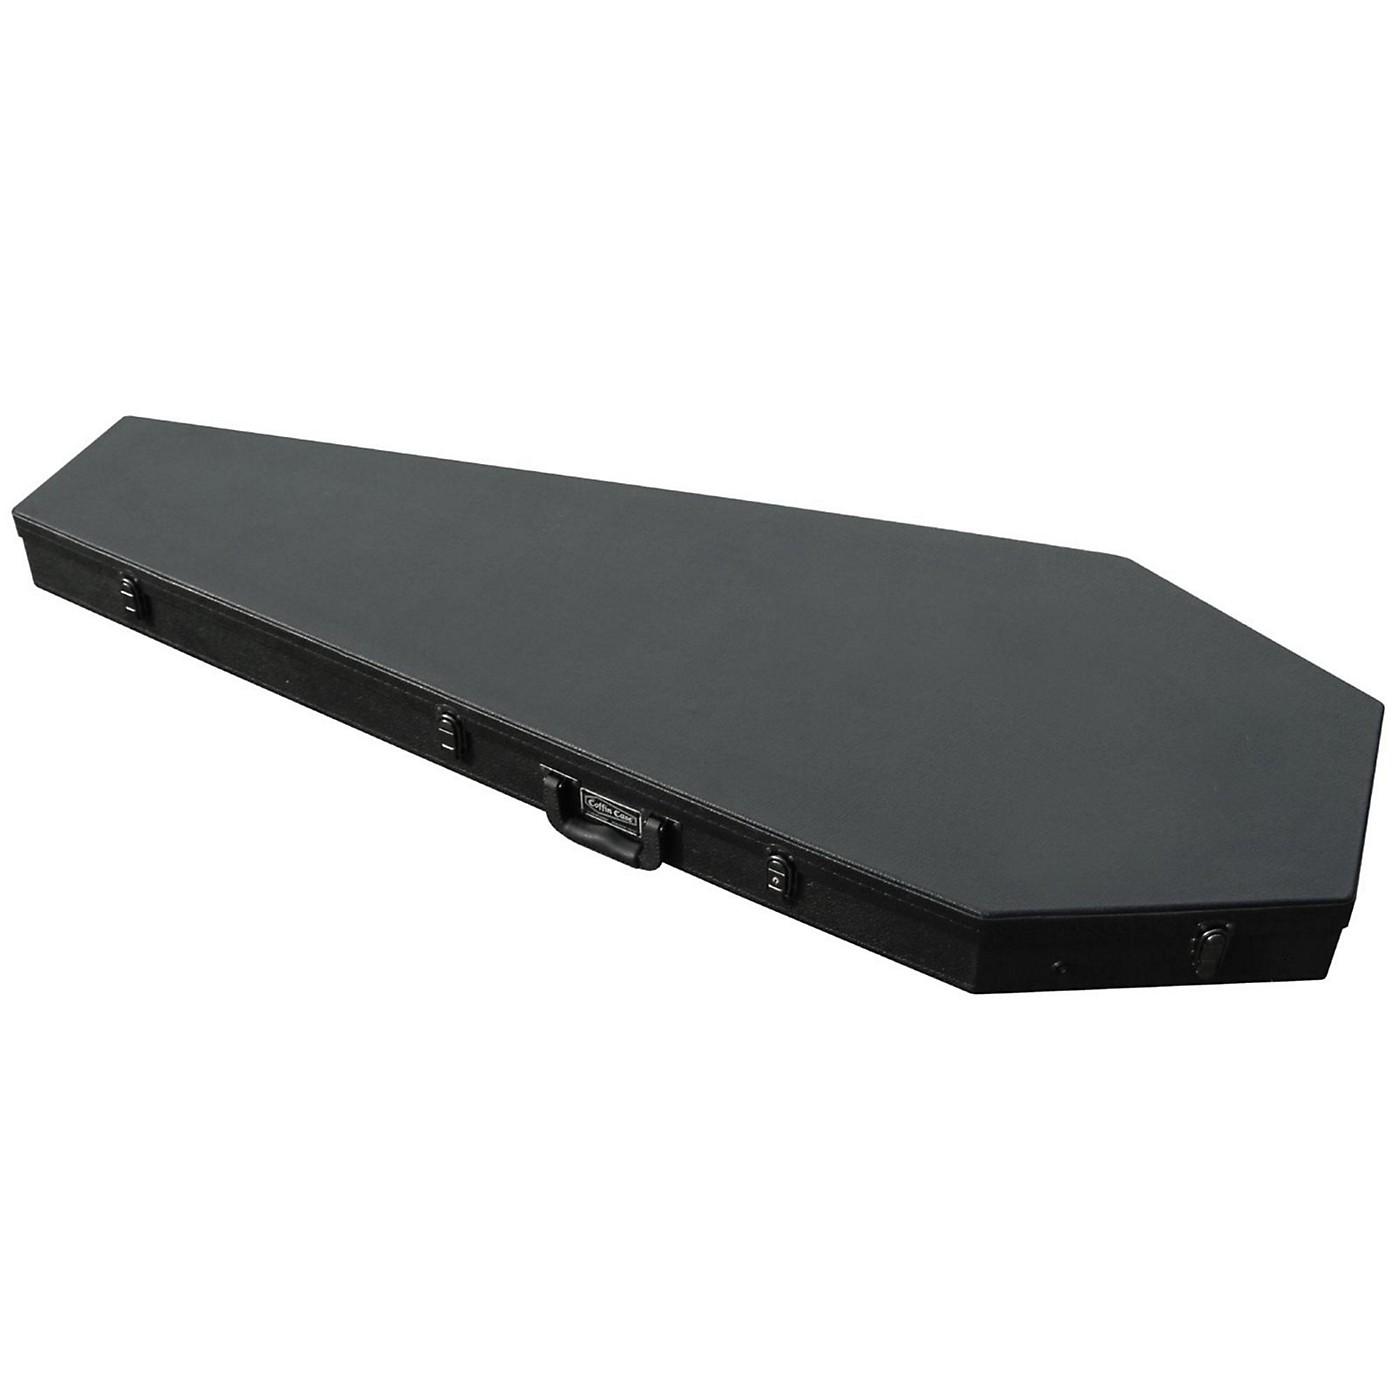 Coffin Case Extreme Guitar Coffin Case thumbnail